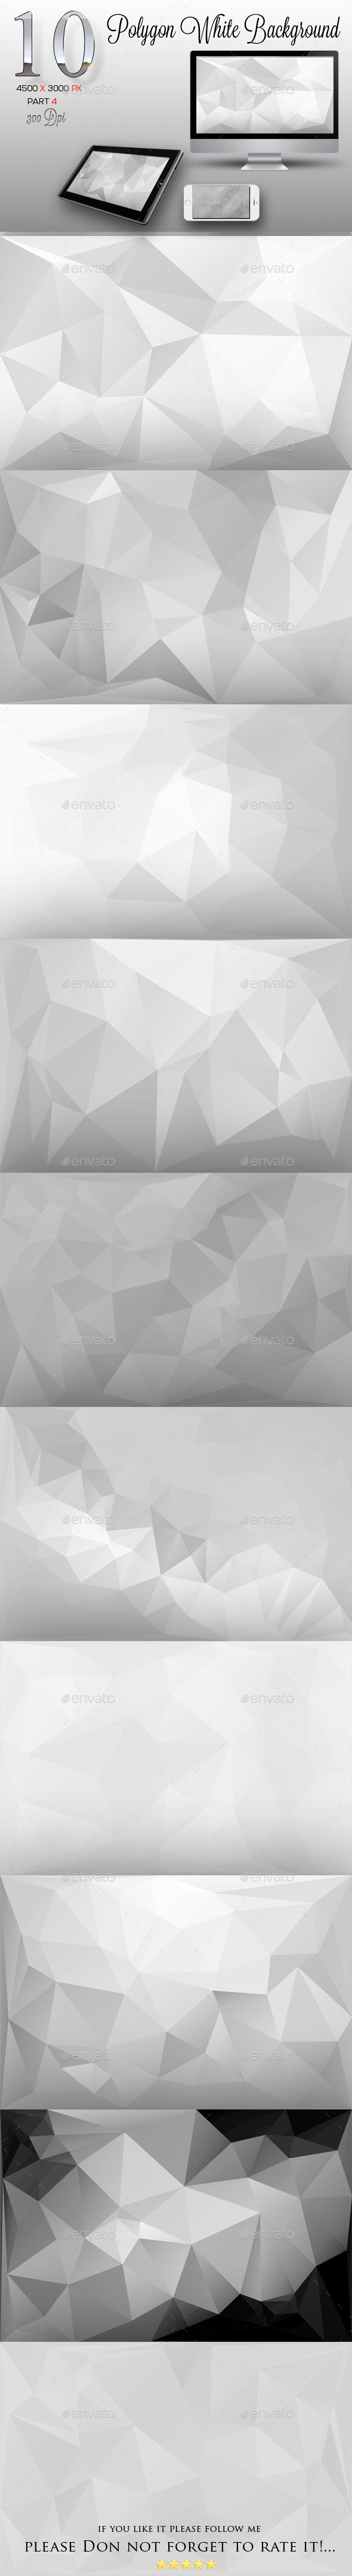 10 Polygon White Background Part 4